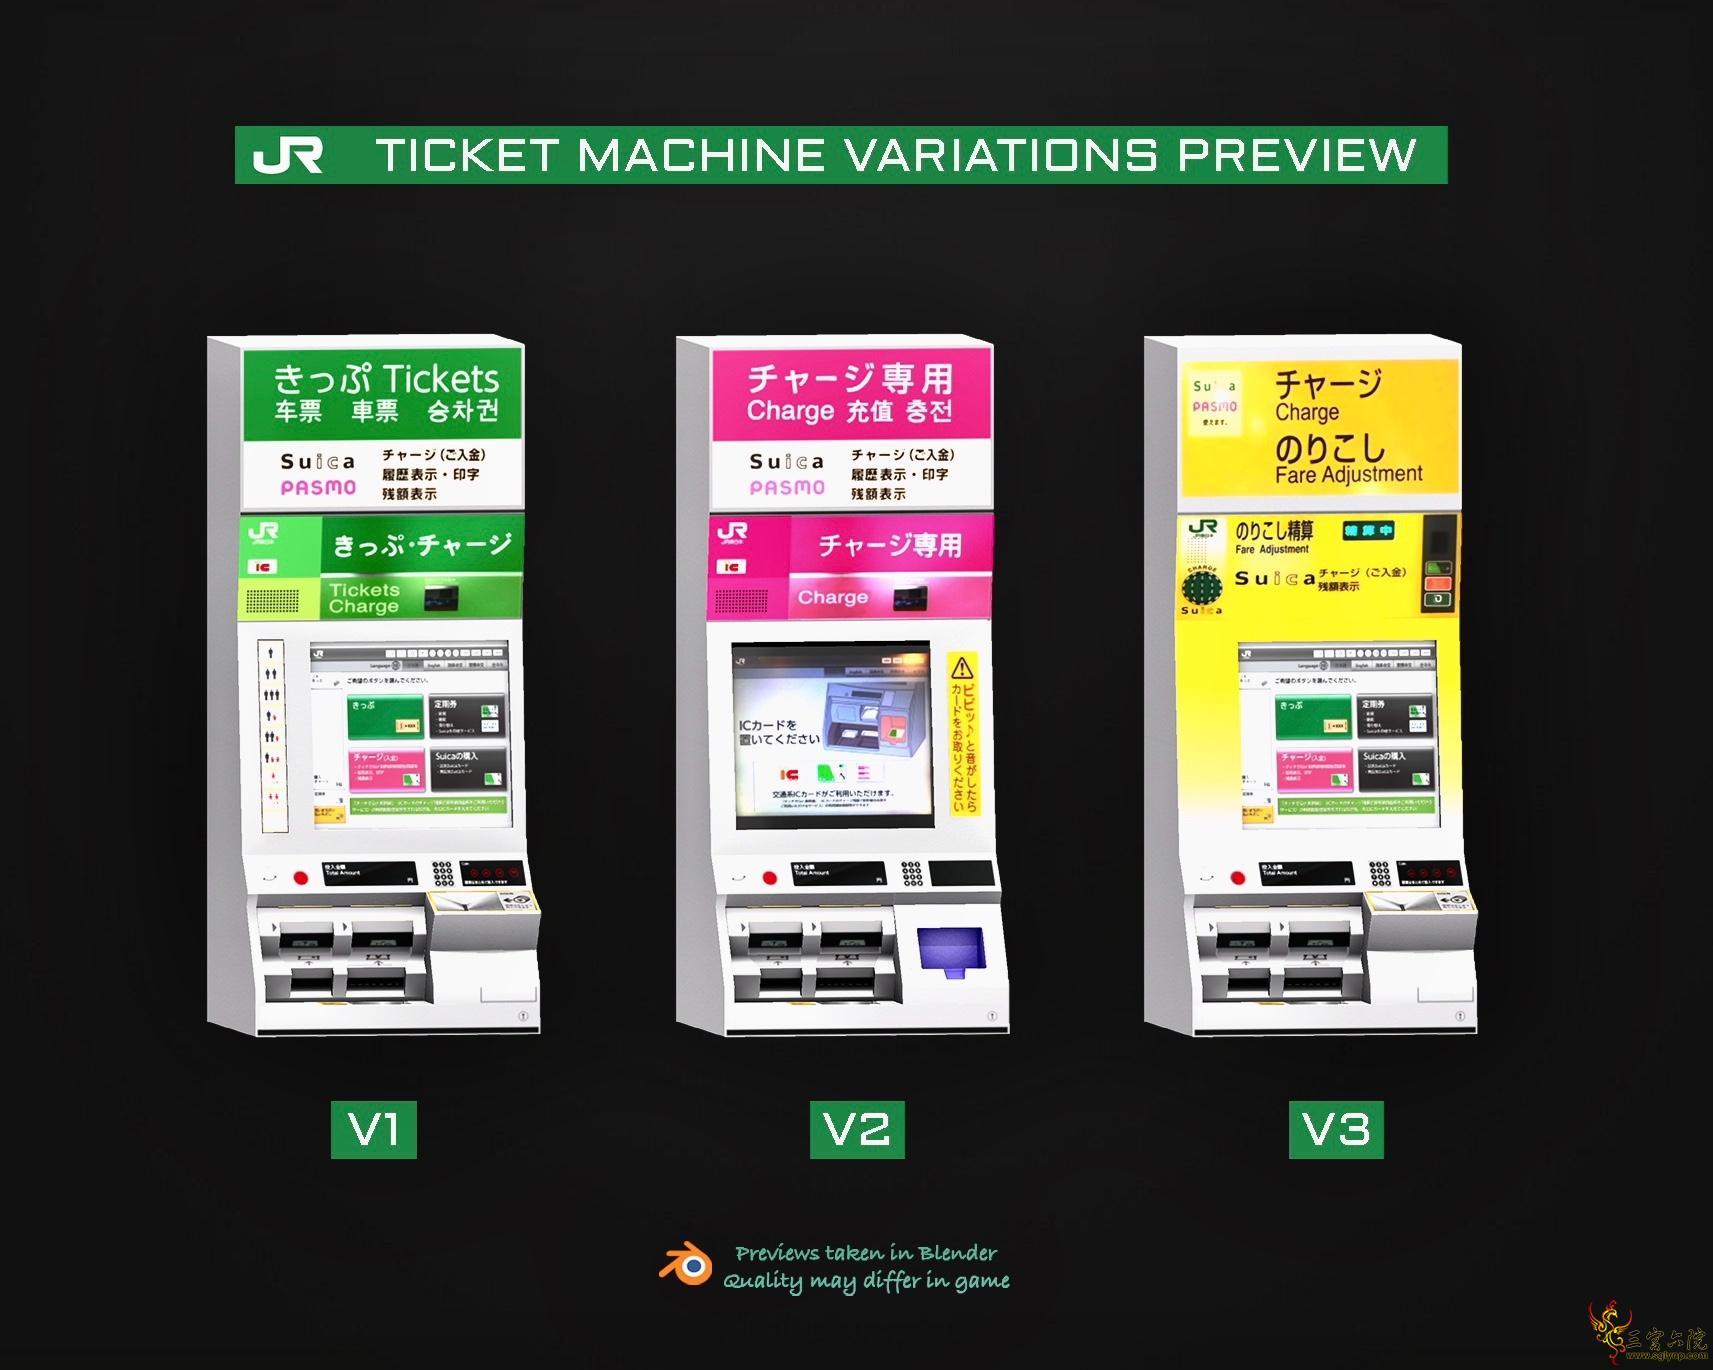 Ticket Machine Preview Variations.jpg